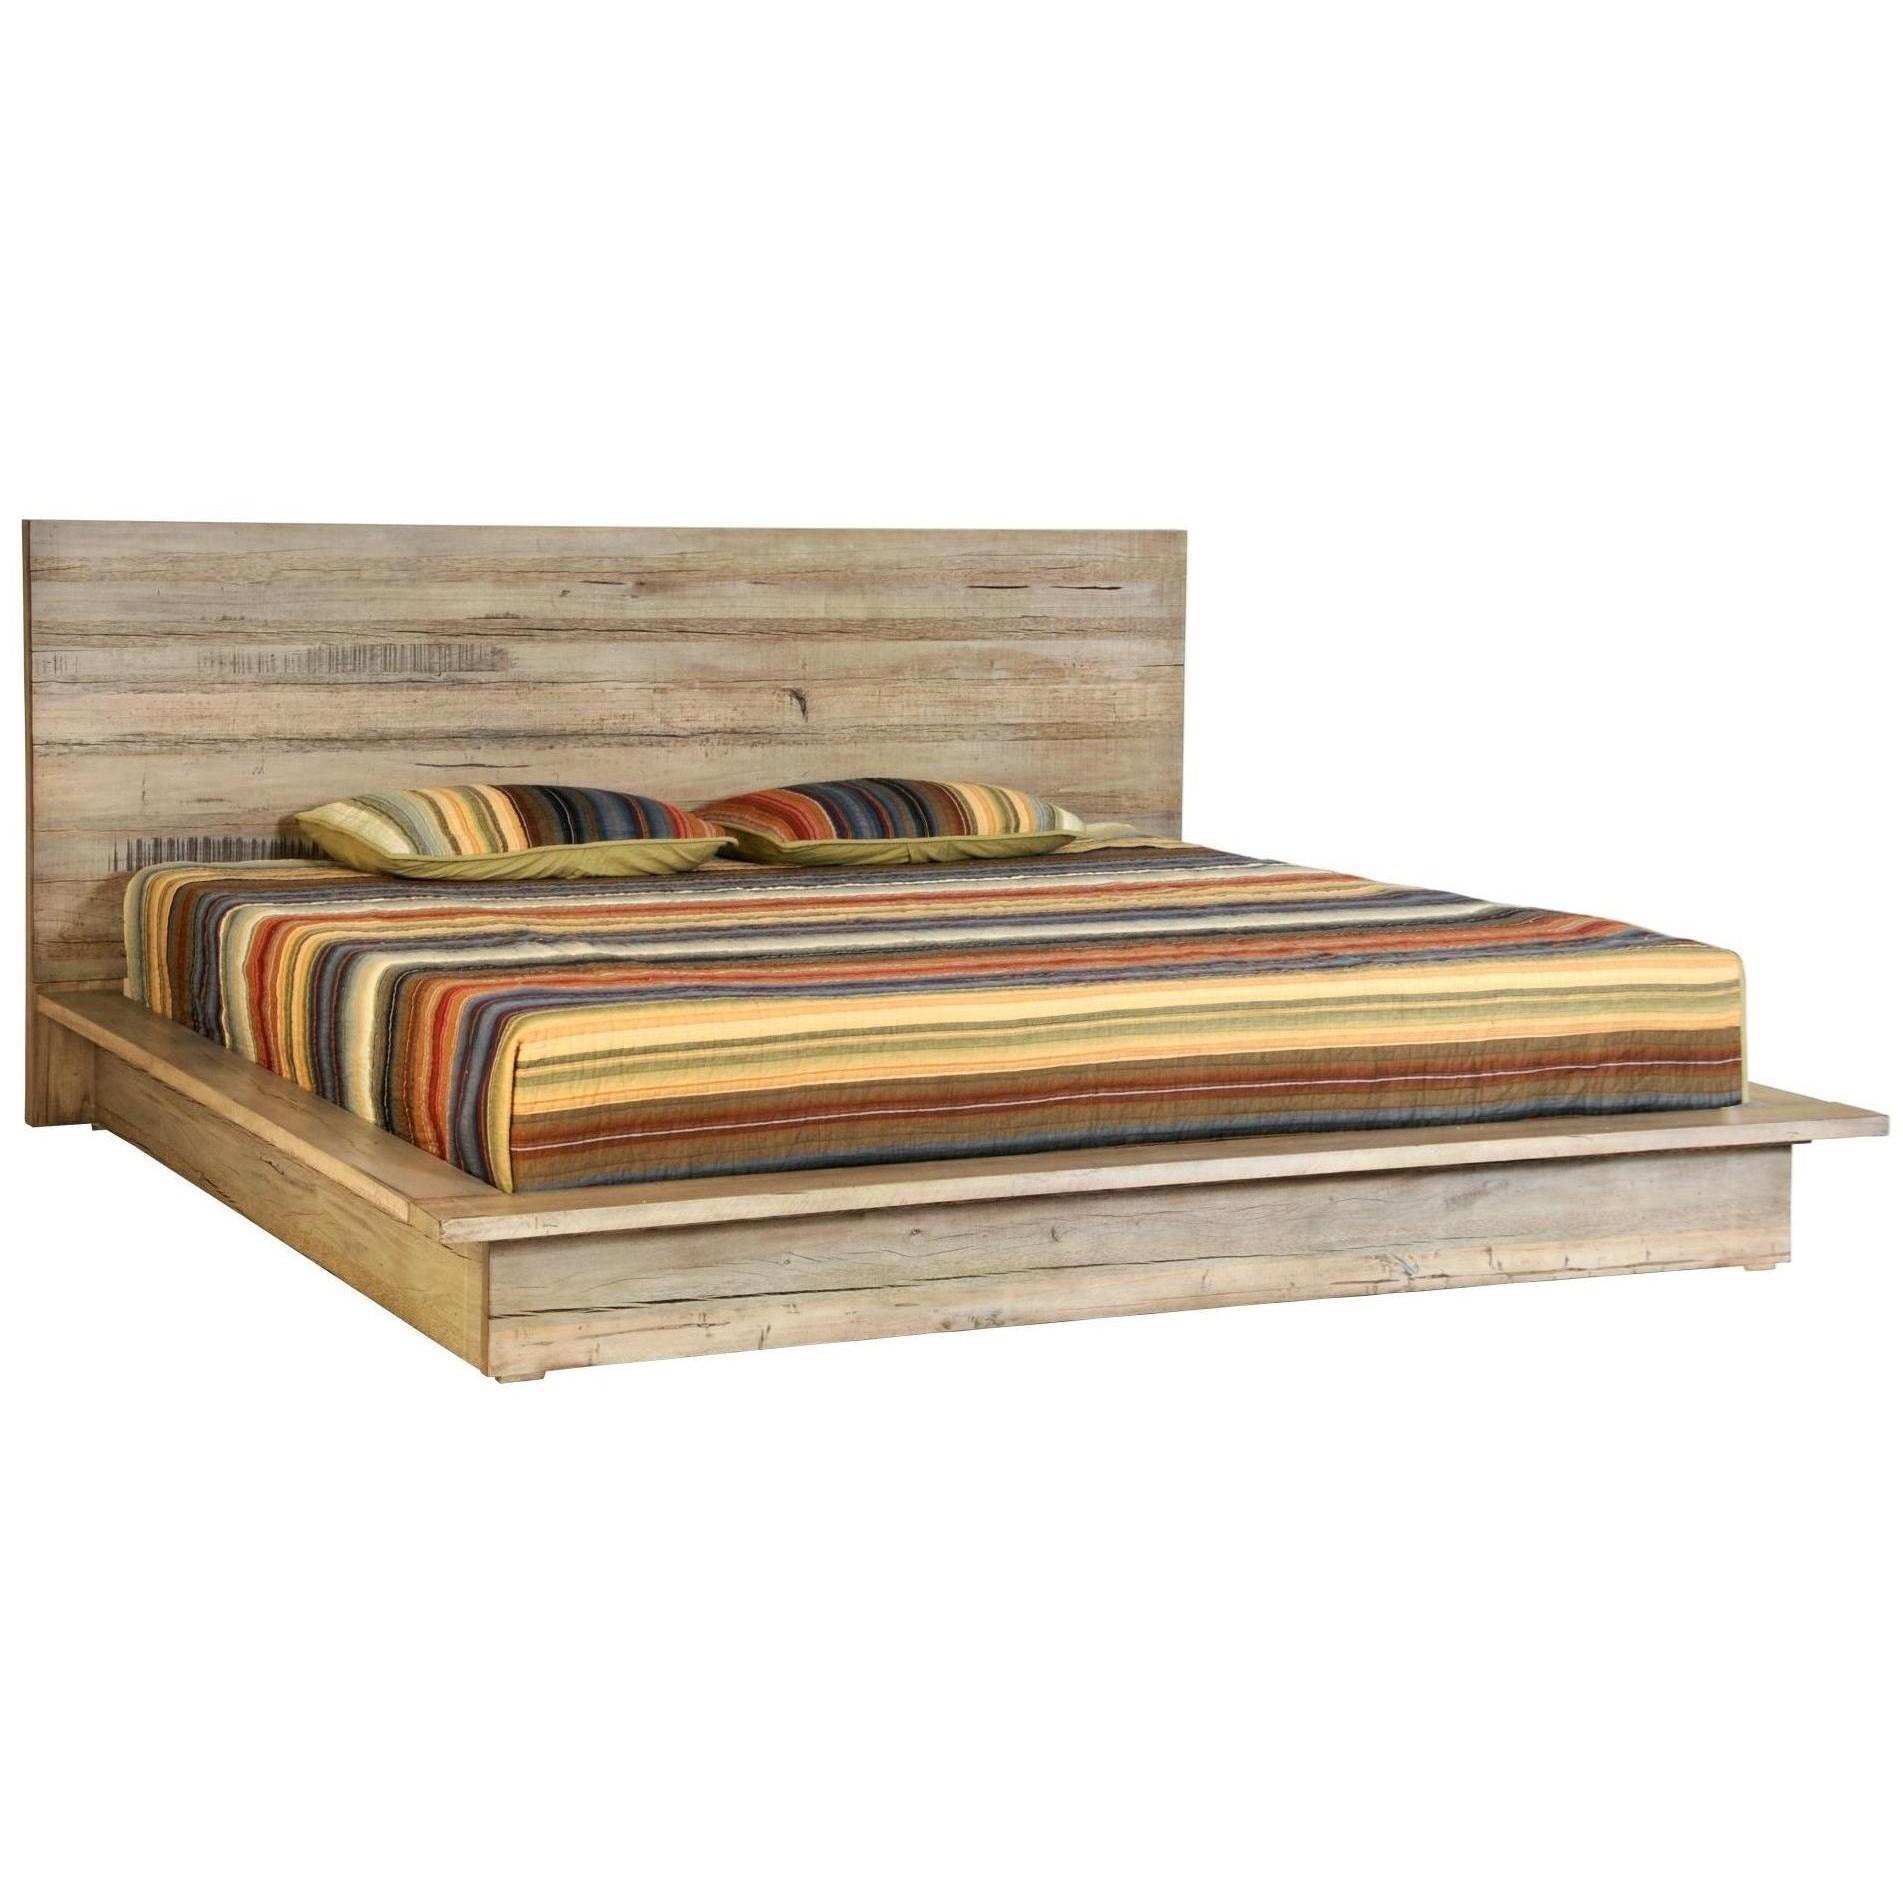 Beds amp Headboards  Bedroom  Furniture amp Mattresses